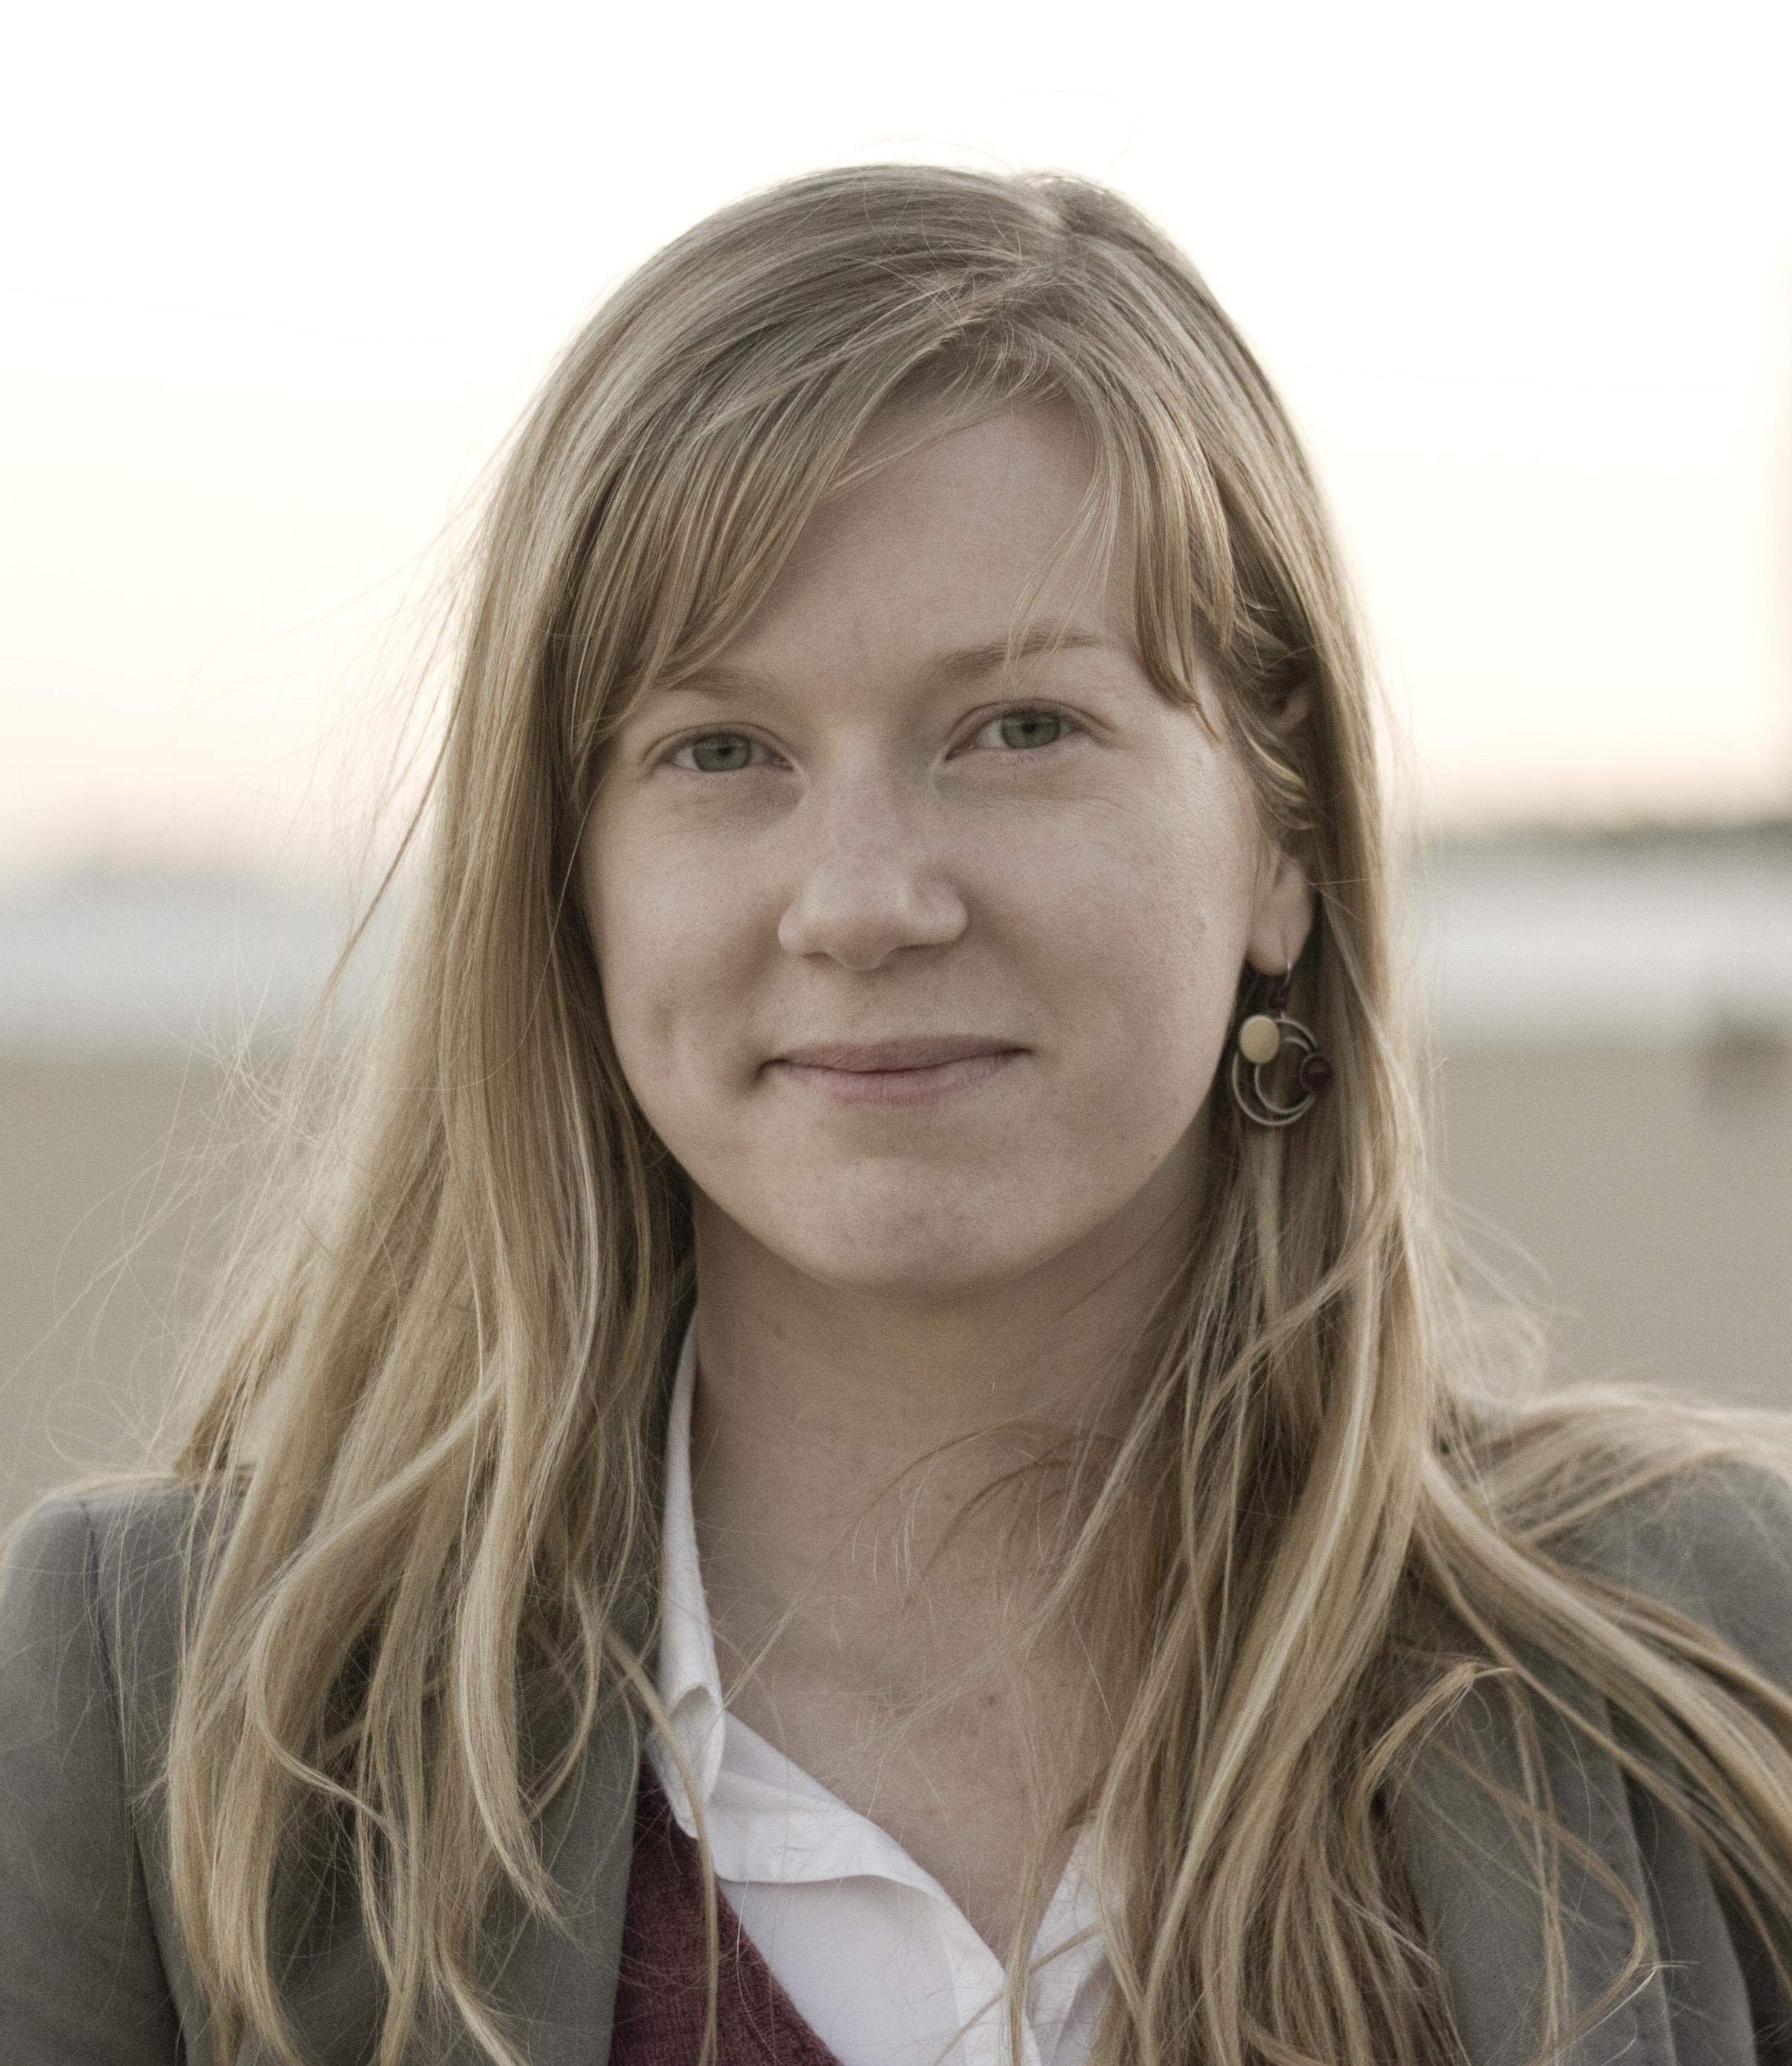 Head shot of Christine Doig